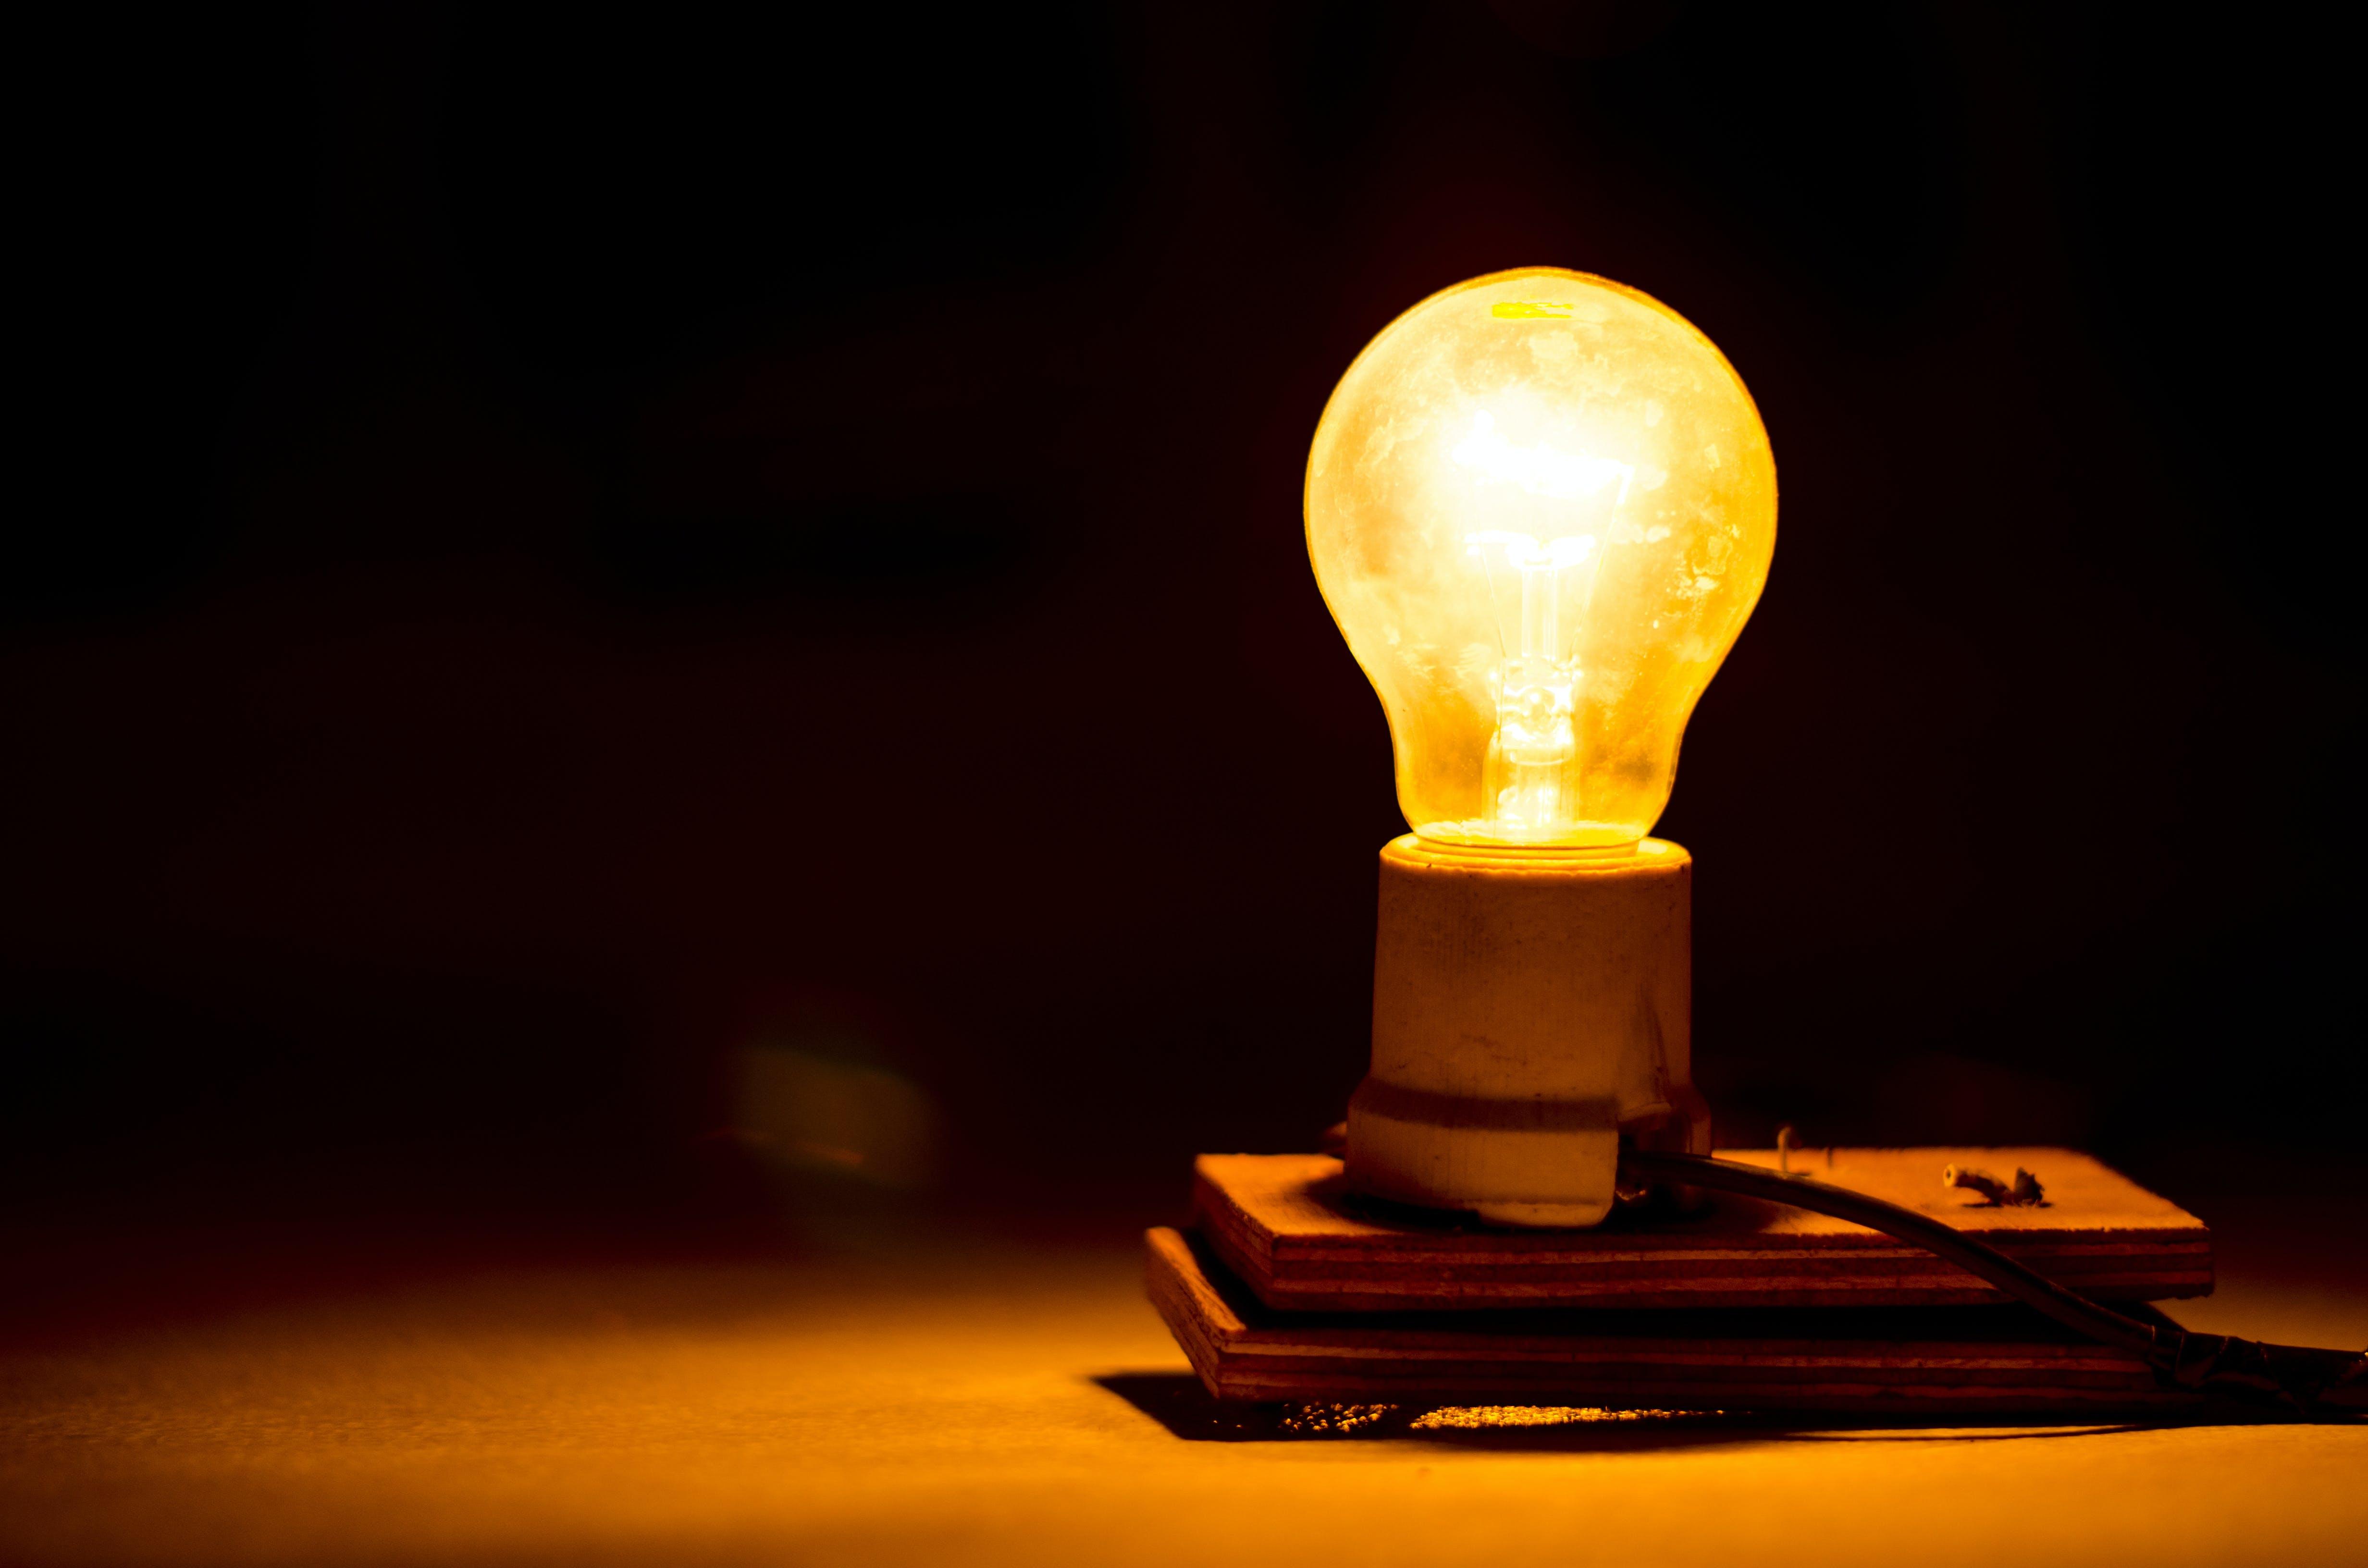 Free stock photo of light, creative, bulb, unique